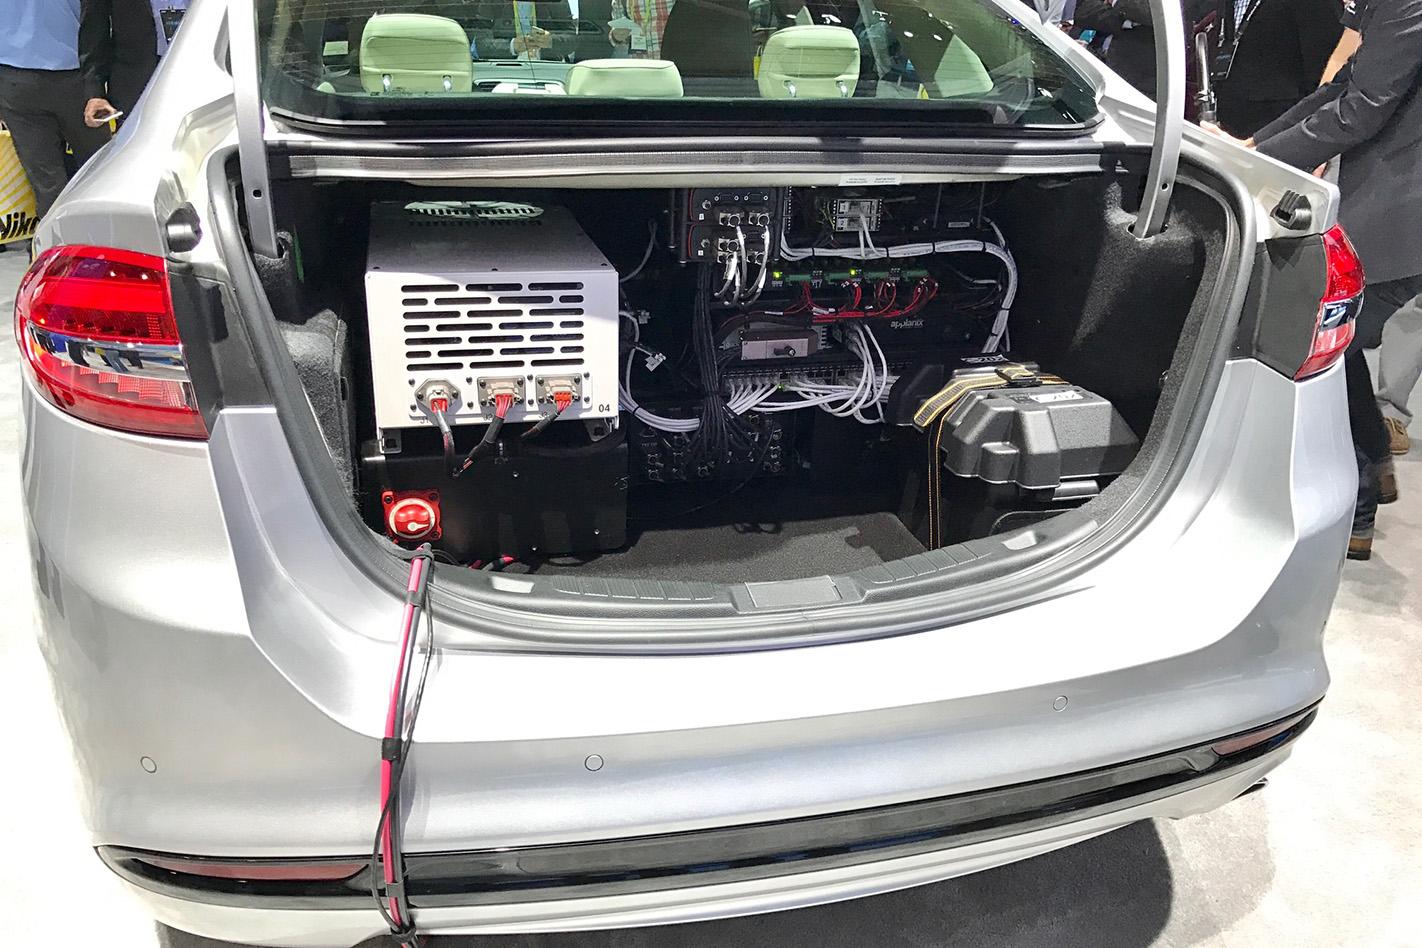 Ford -Fusion -autonomous -boot -electronics